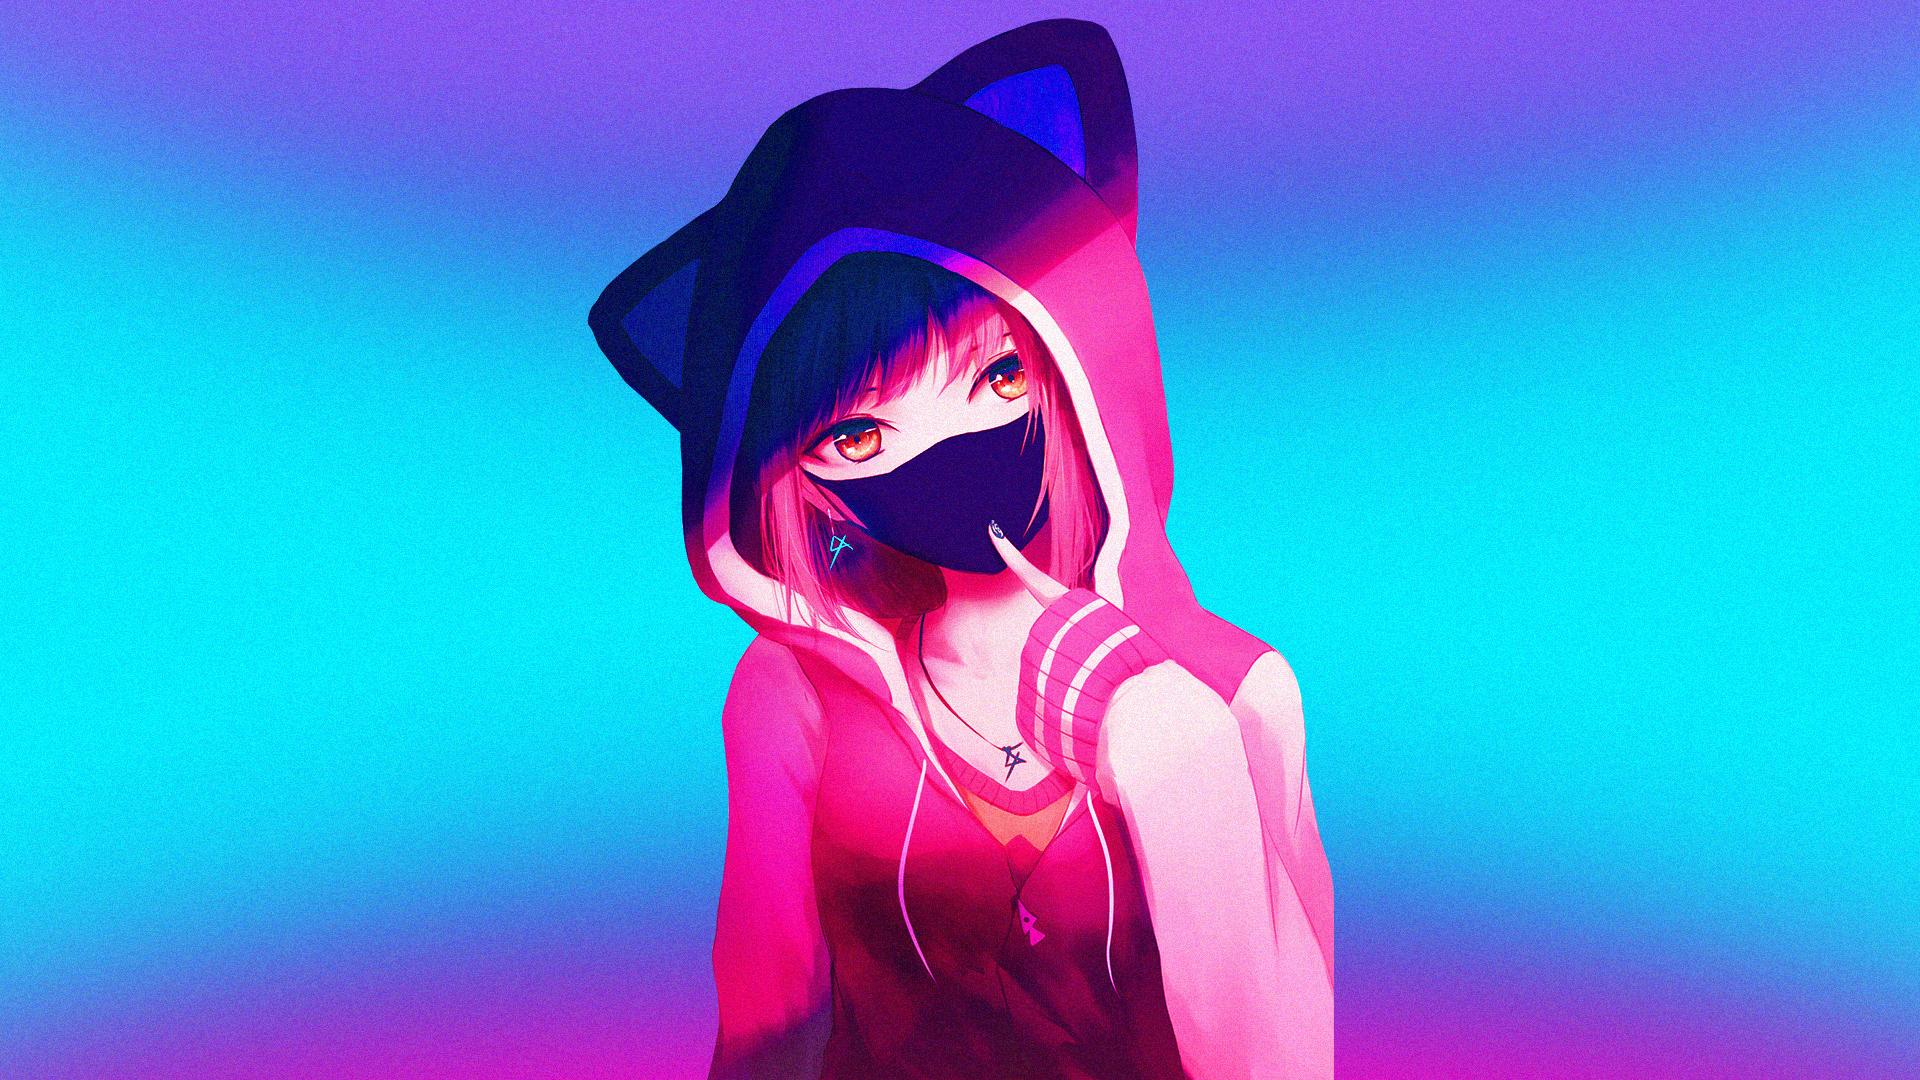 Wallpaper anime girls artwork simple background - Anime wallpaper hoodie ...